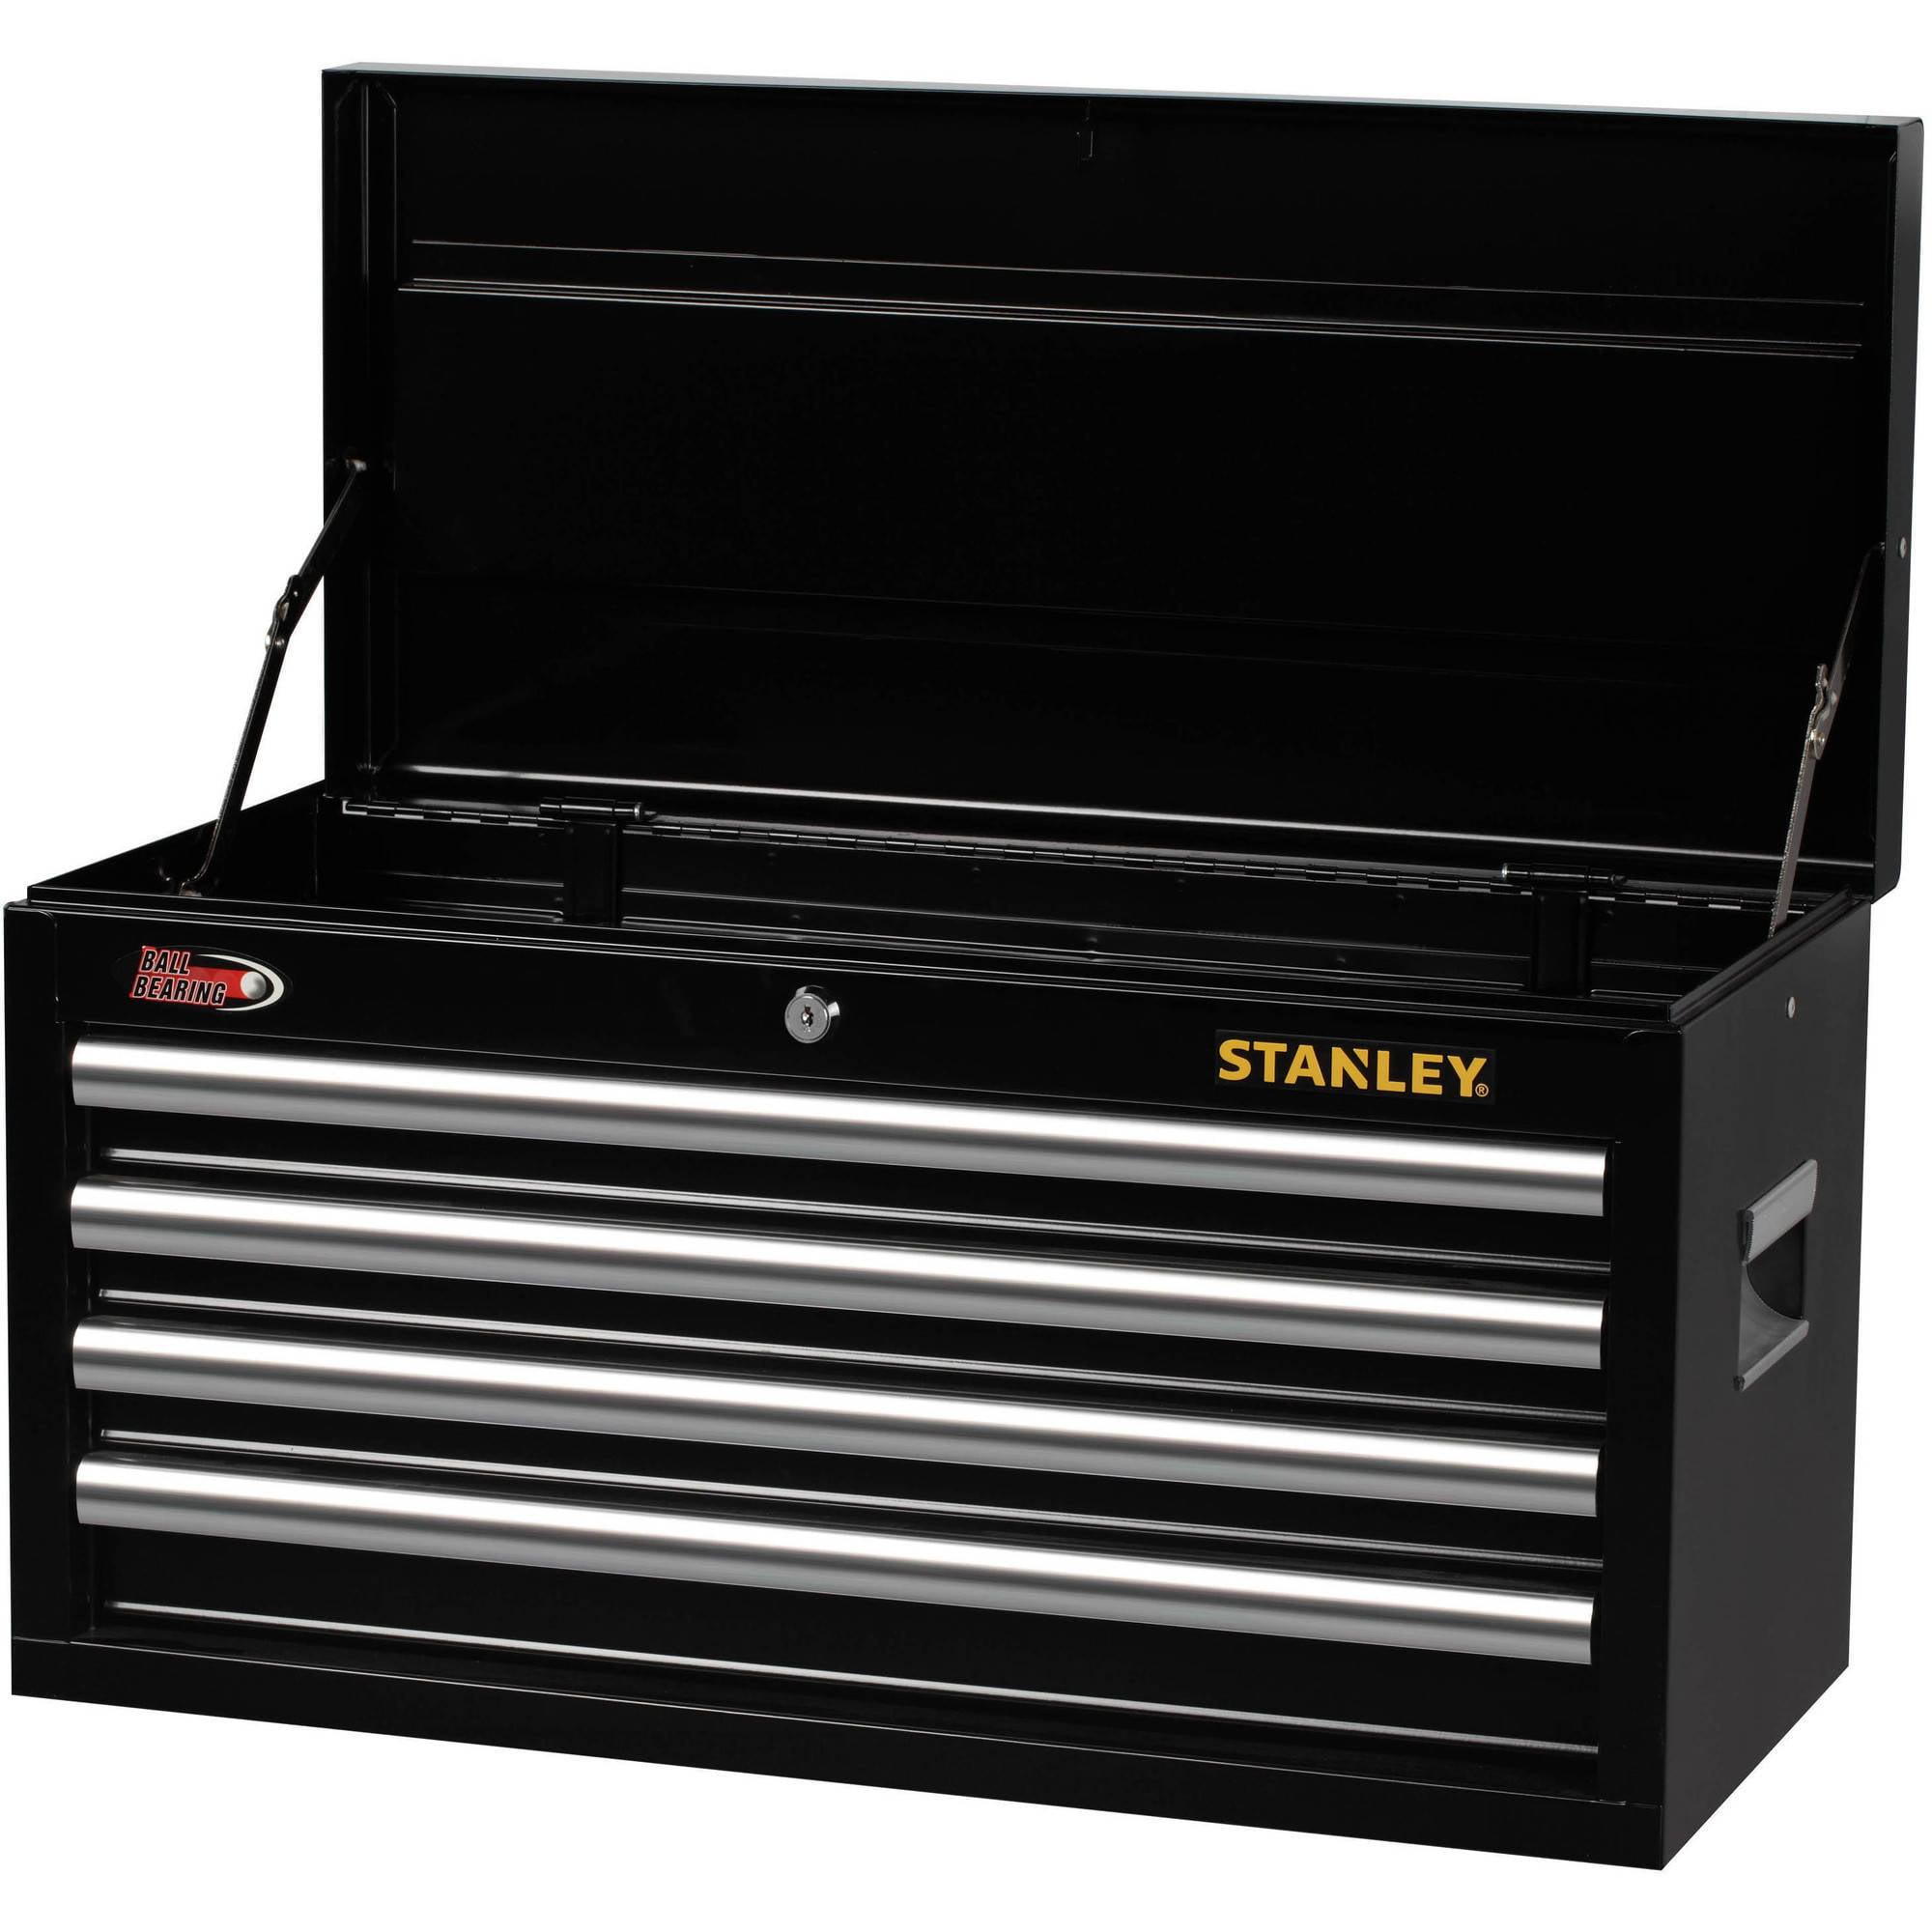 Stanley 4-Drawer Chest, Black